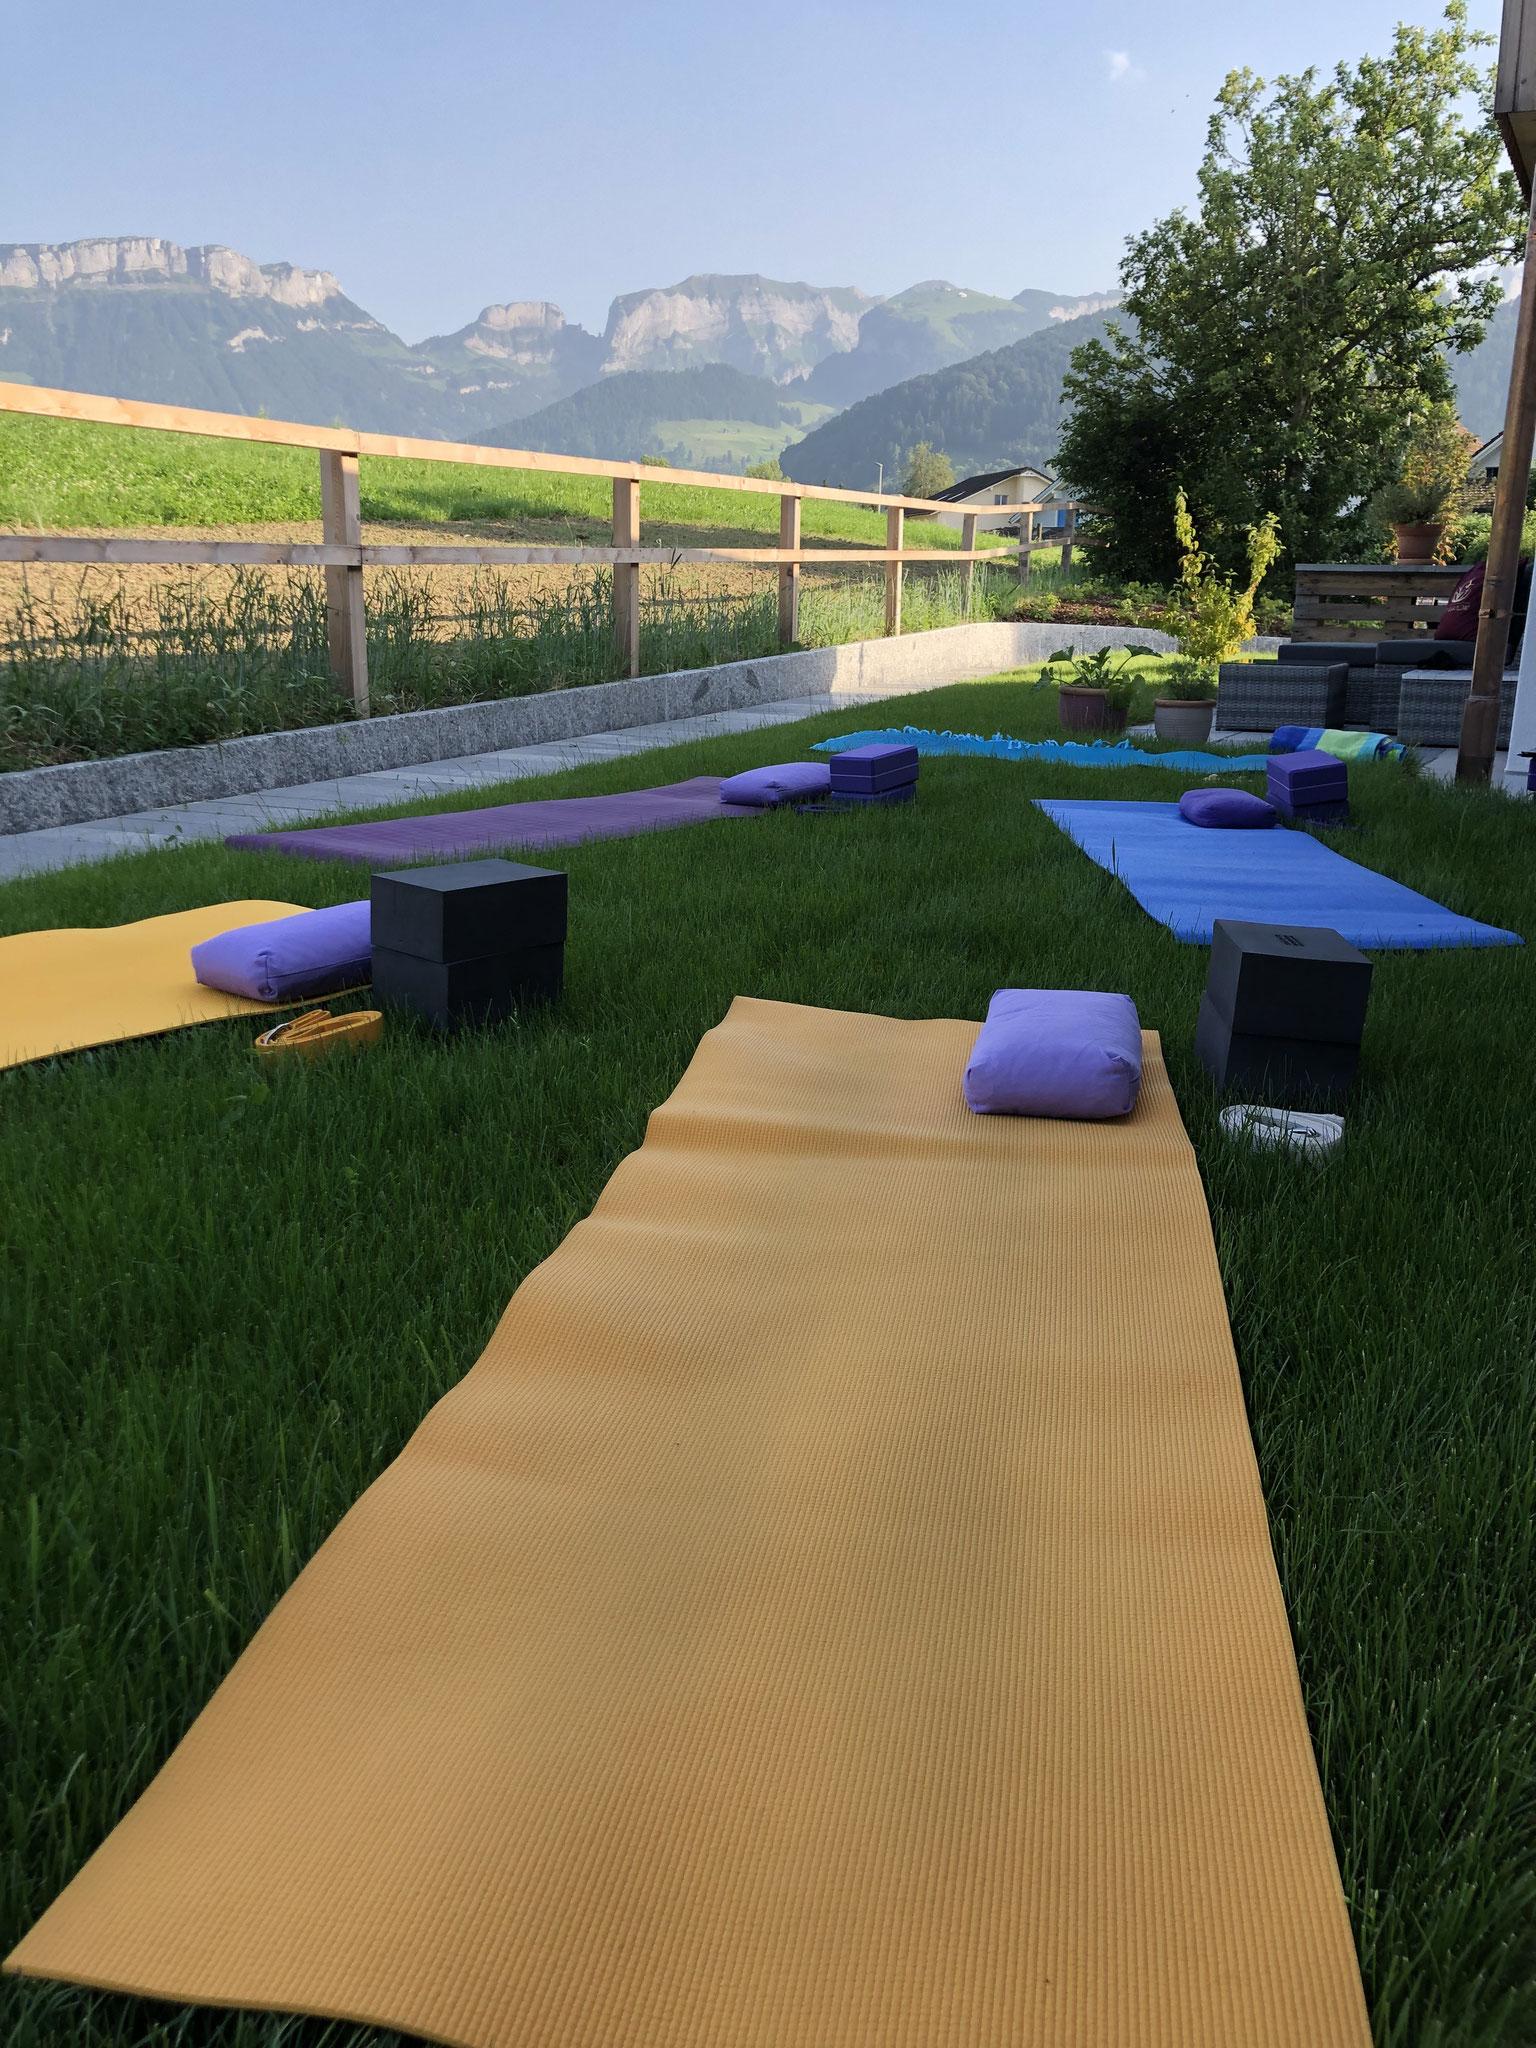 Magic-View-Yoga:-)